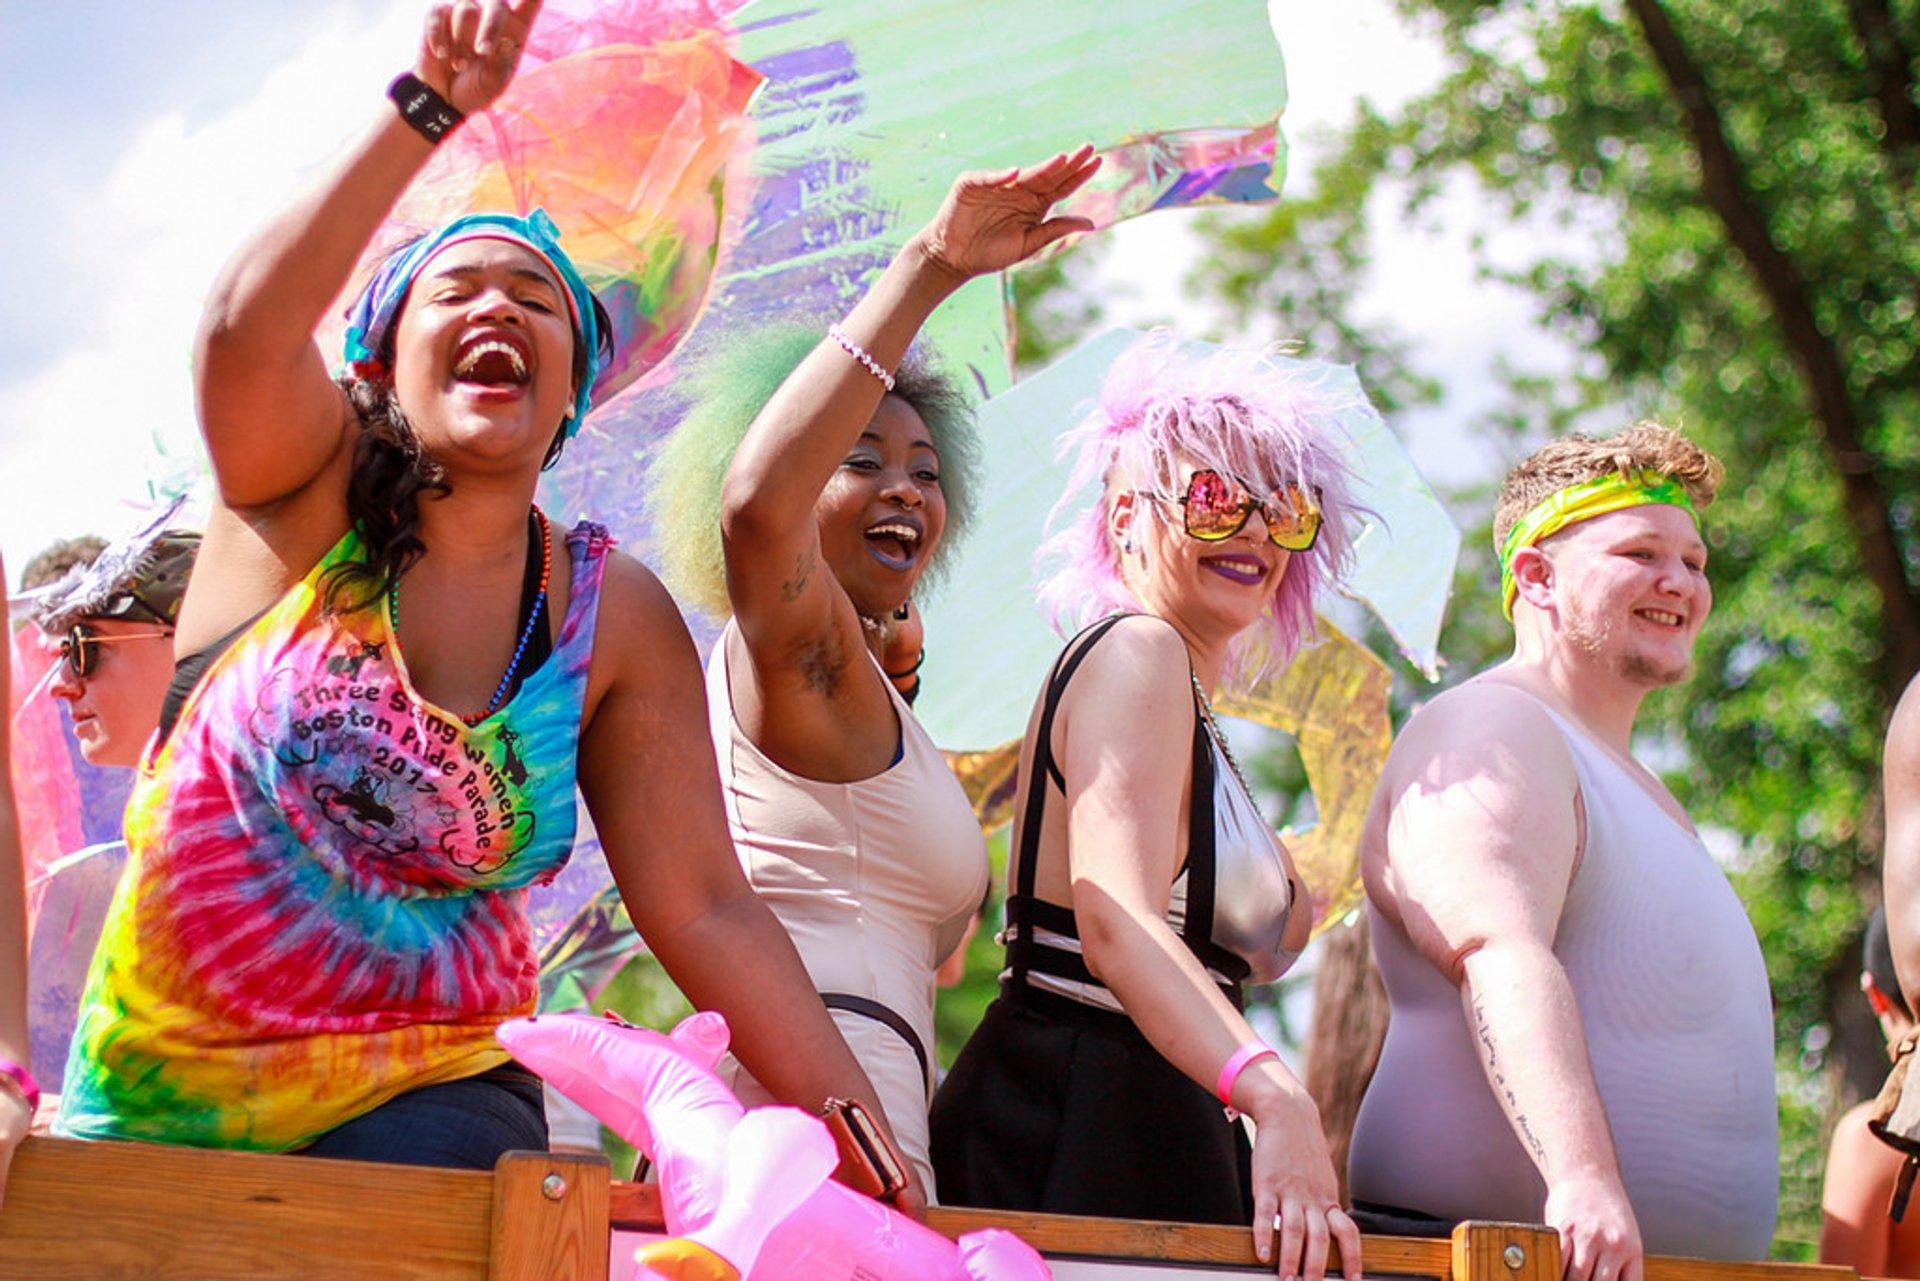 Boston Pride Parade in Boston 2020 - Best Time